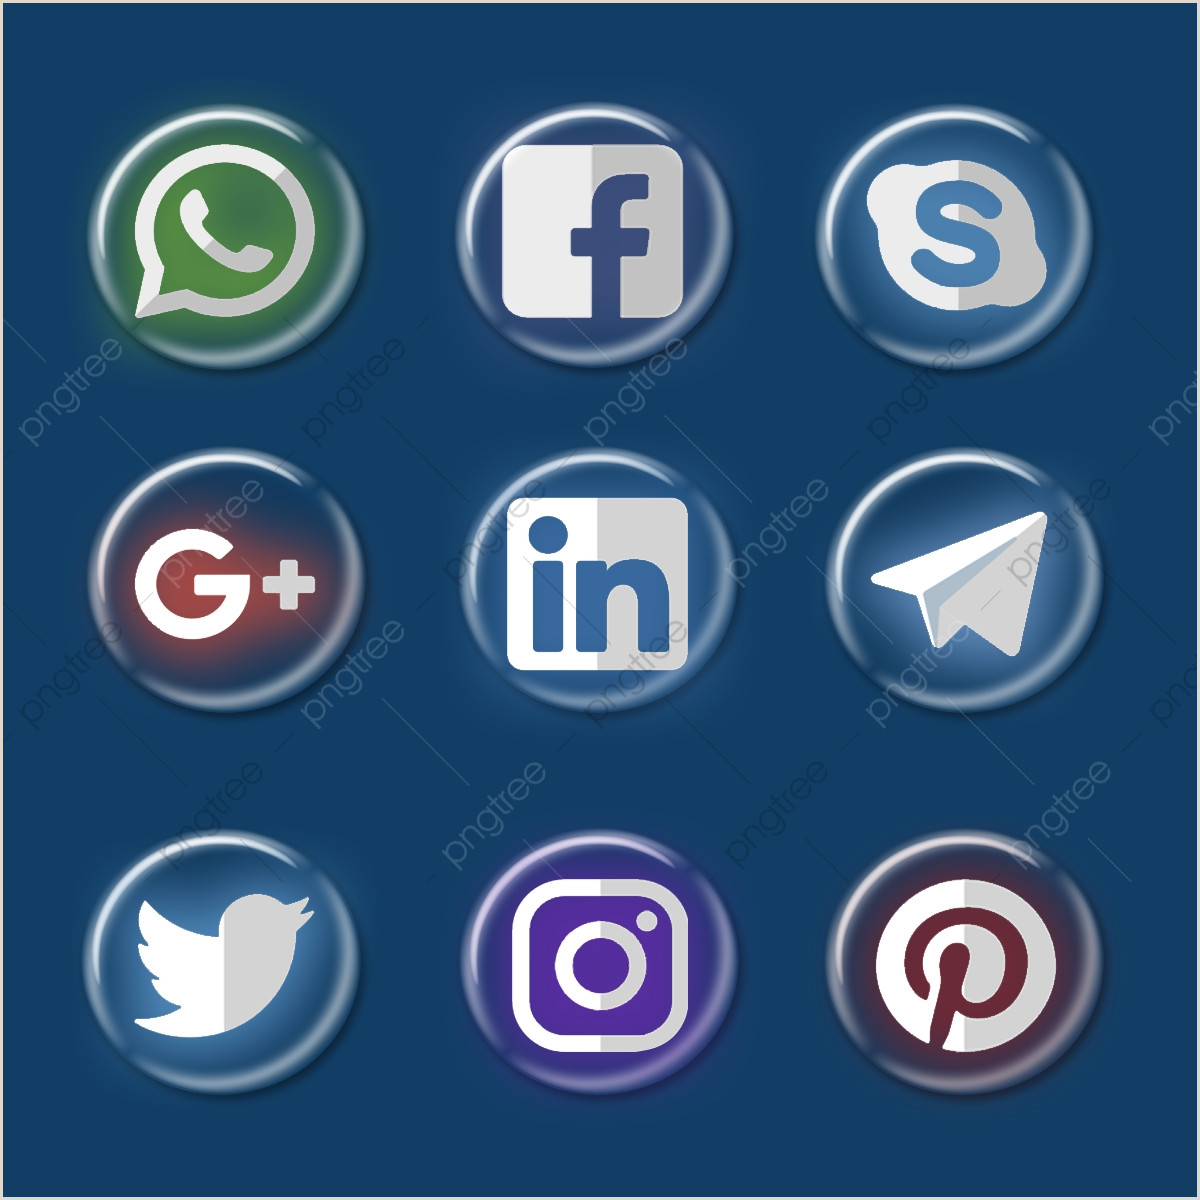 Social Media Symbols For Business Cards Social Media Icons Set Business Cards Visiing Card Png